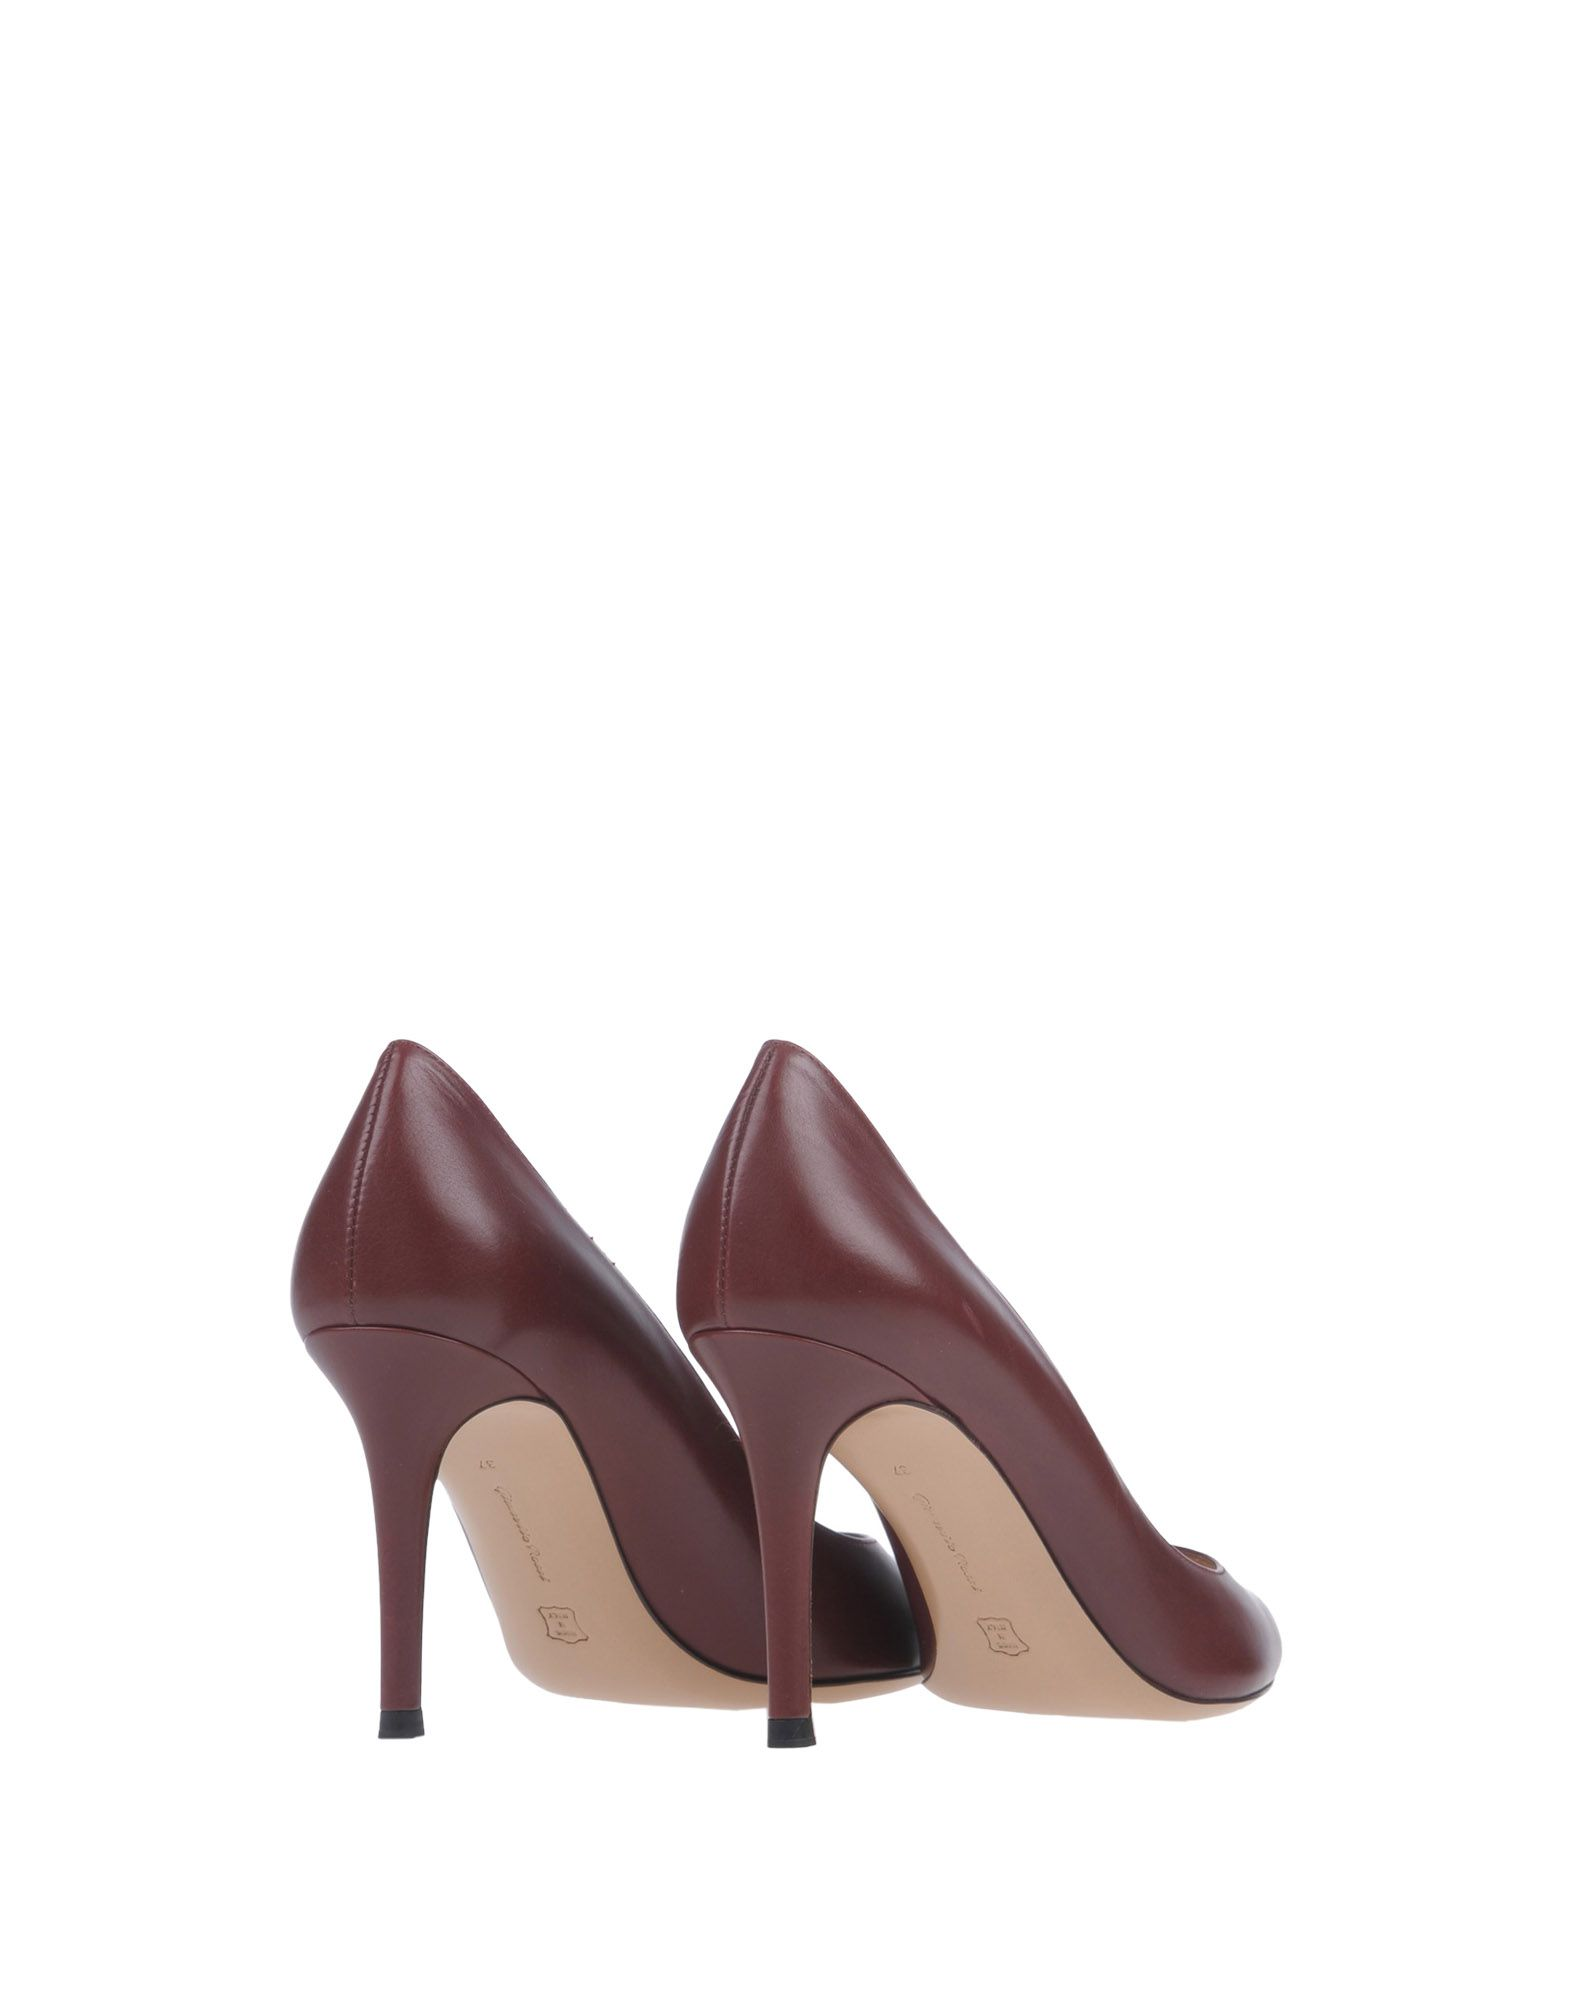 Gianvito Rossi Pumps Schuhe Damen  11330881UG Neue Schuhe Pumps 9bd6d5